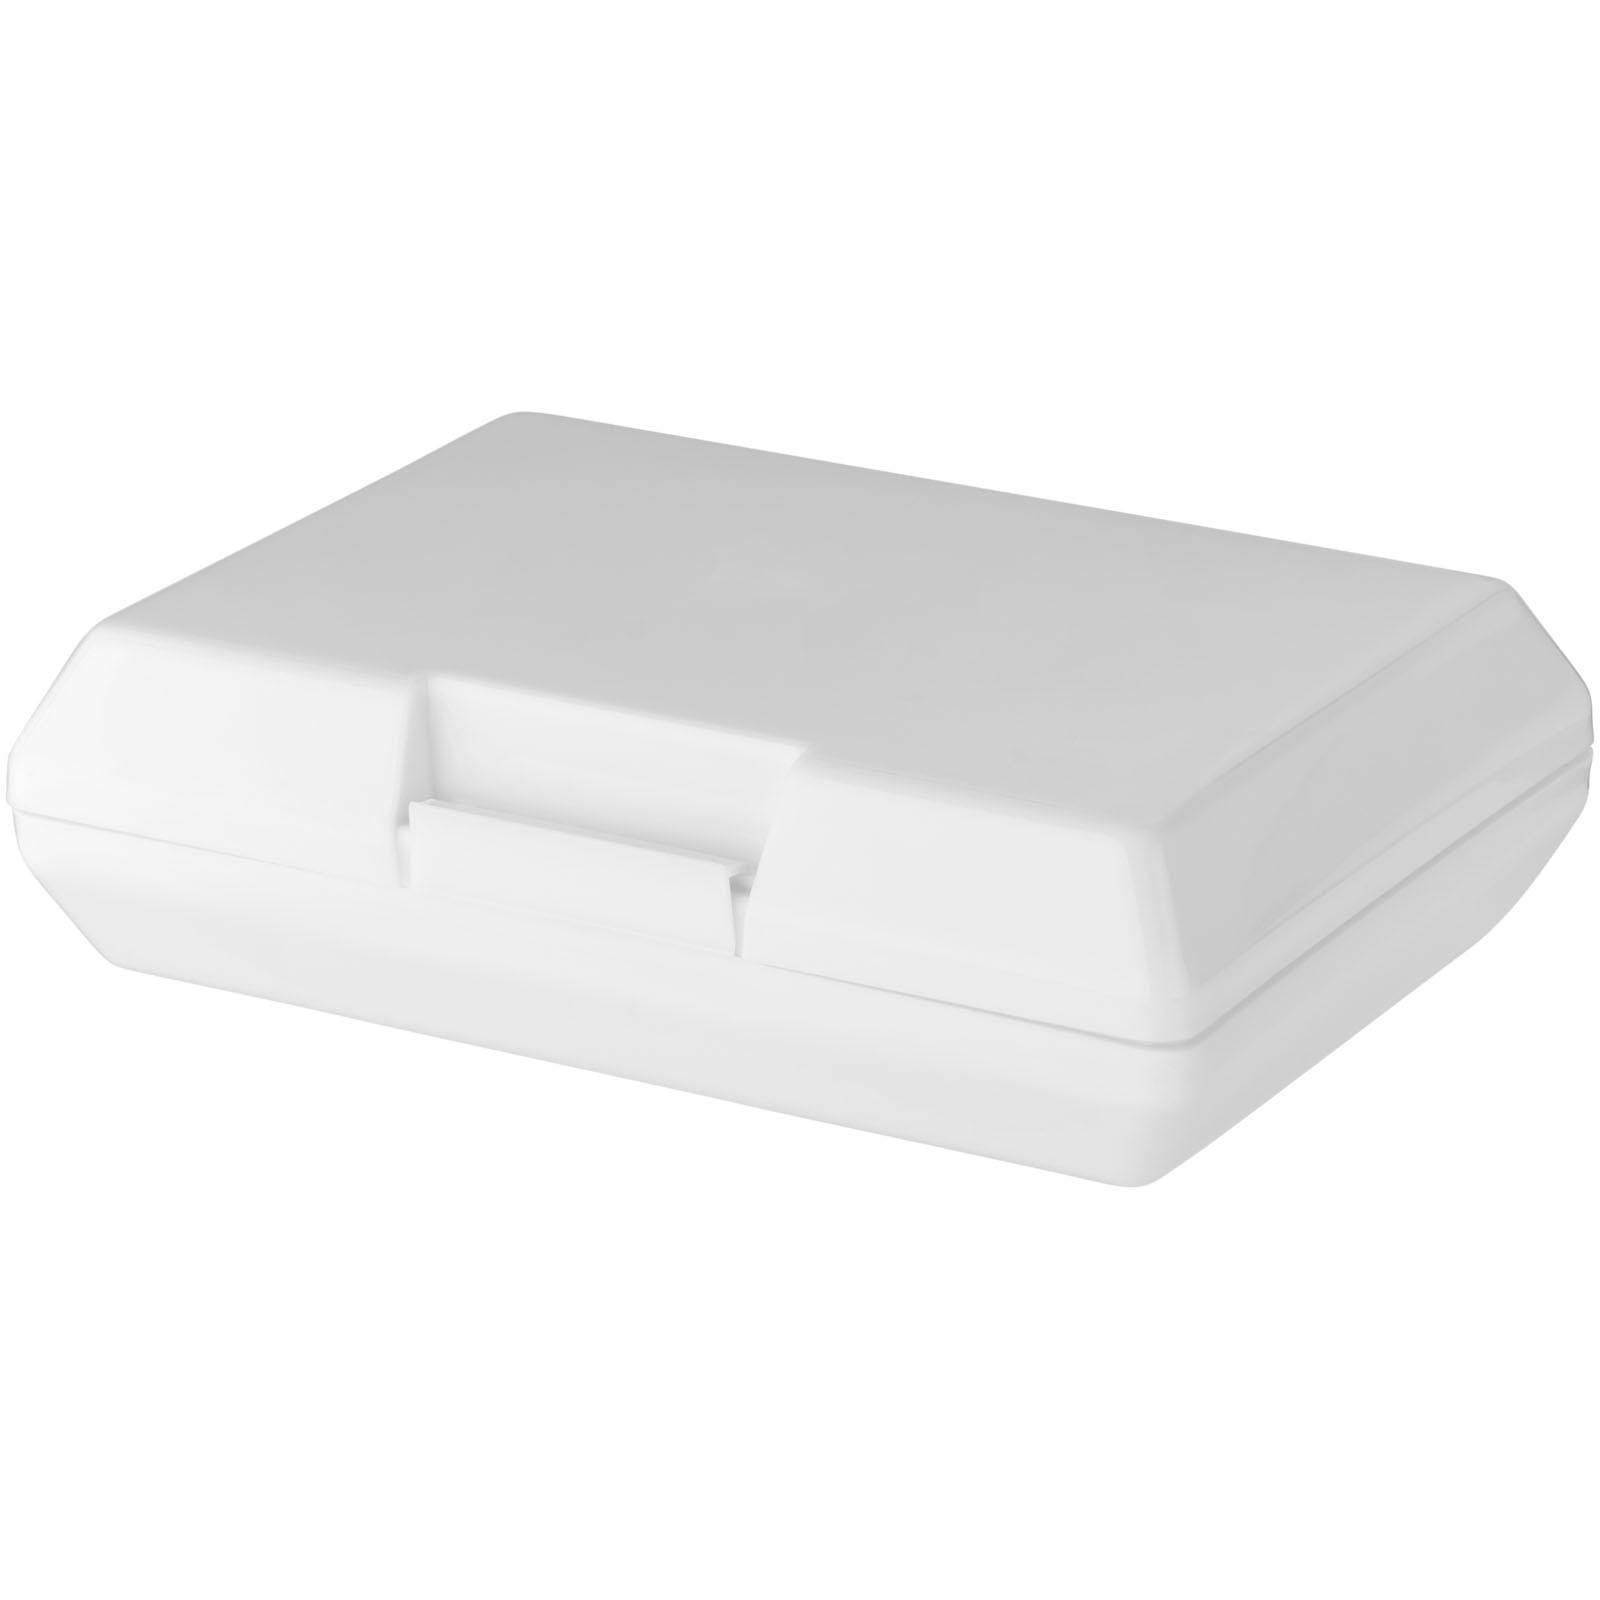 Svačinová krabička Oblong - Bílá